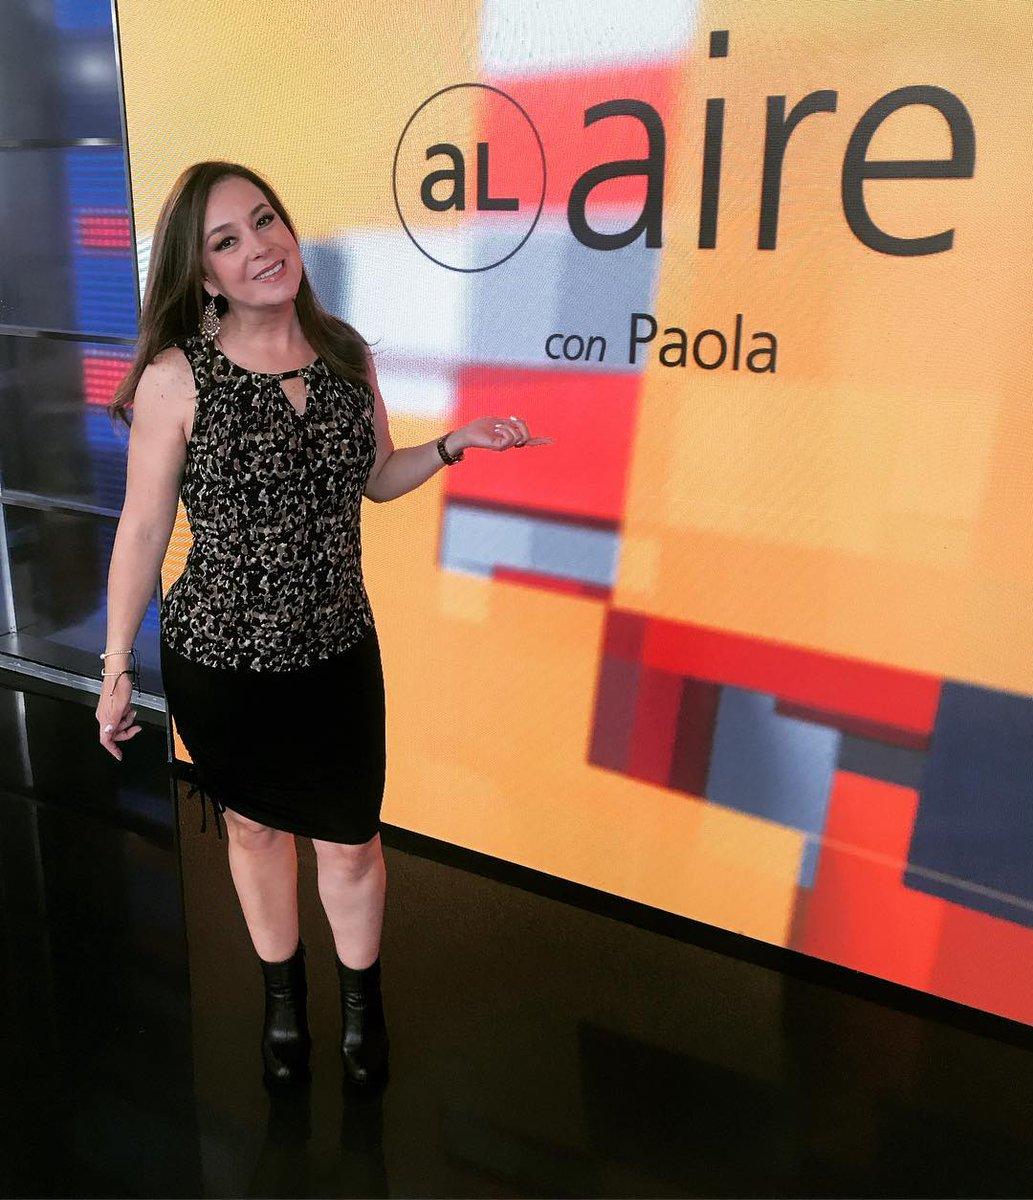 Raquel Méndez Avalos On Twitter Gracias